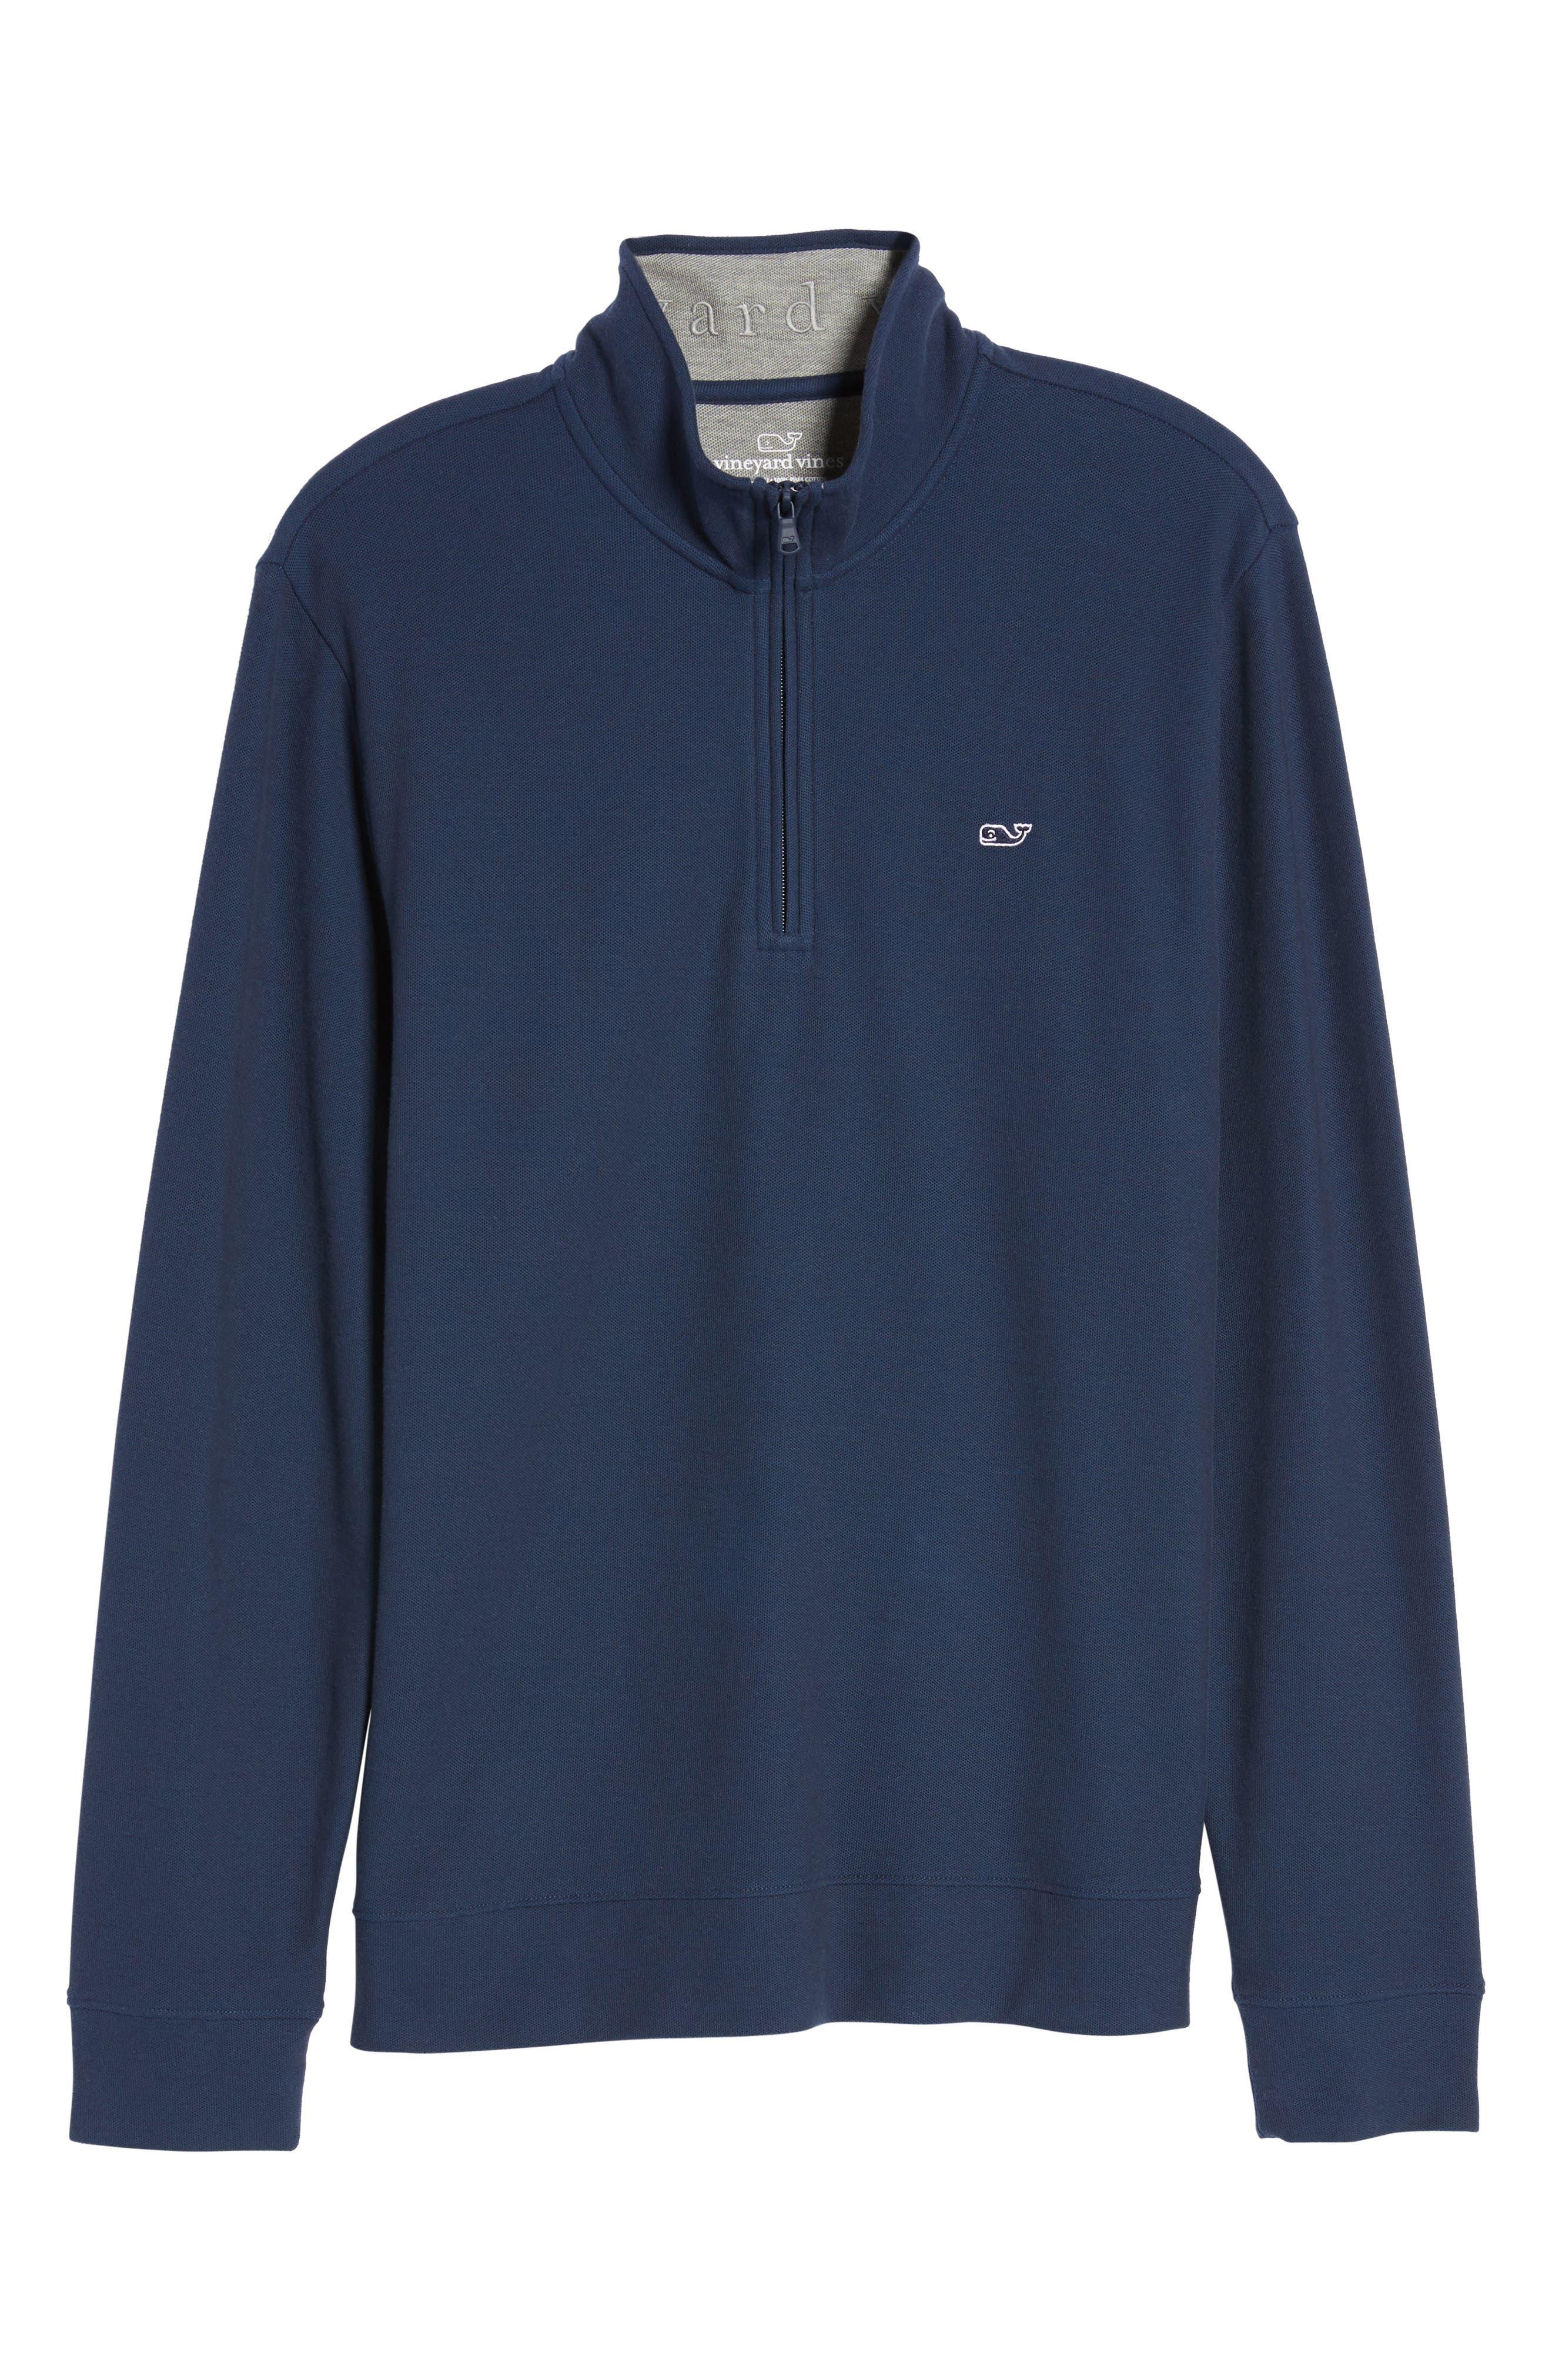 Reverse Oxford Quarter Zip Pullover,                             Alternate thumbnail 6, color,                             Vineyard Navy